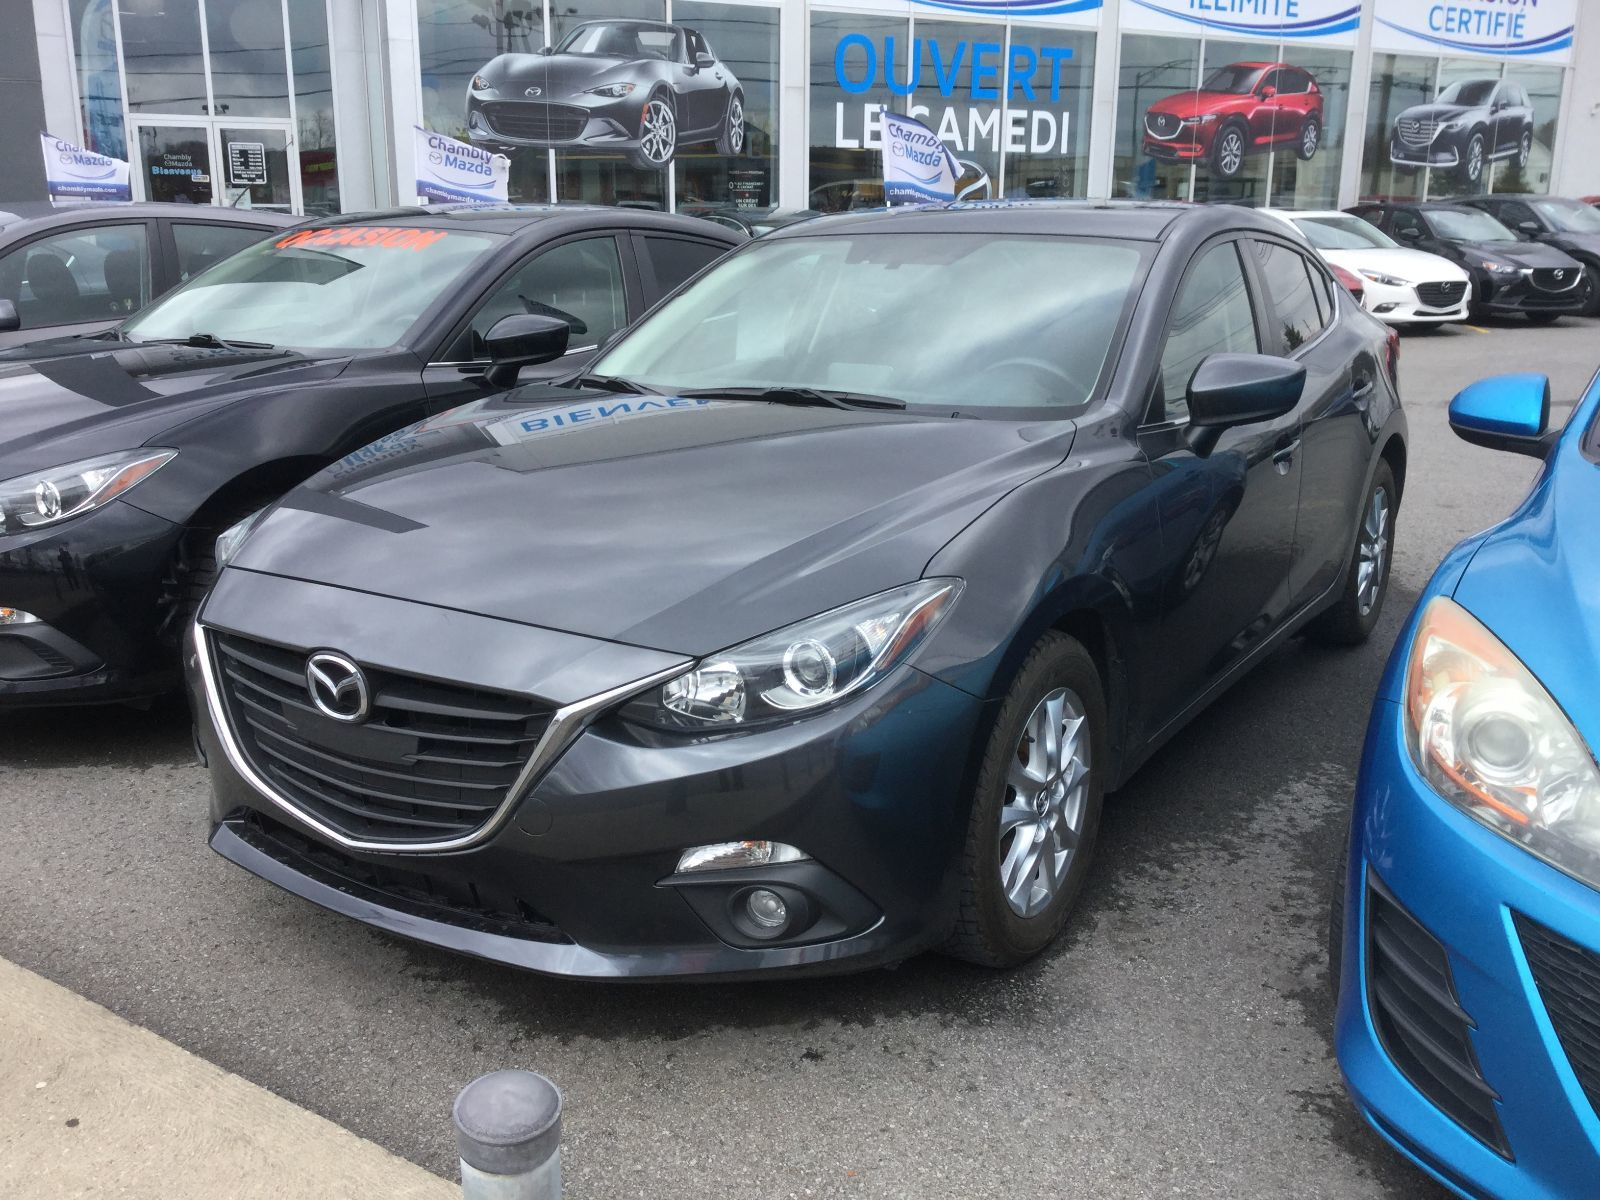 Mazda Mazda3 **RÉSERVÉ**GS, SIÈGE CHAUFFANTS, BLUETOOTH, CAMERA 2015 JAMAIS ACCIDENTÉ, UN SEUL PROPRIÉTAIRE